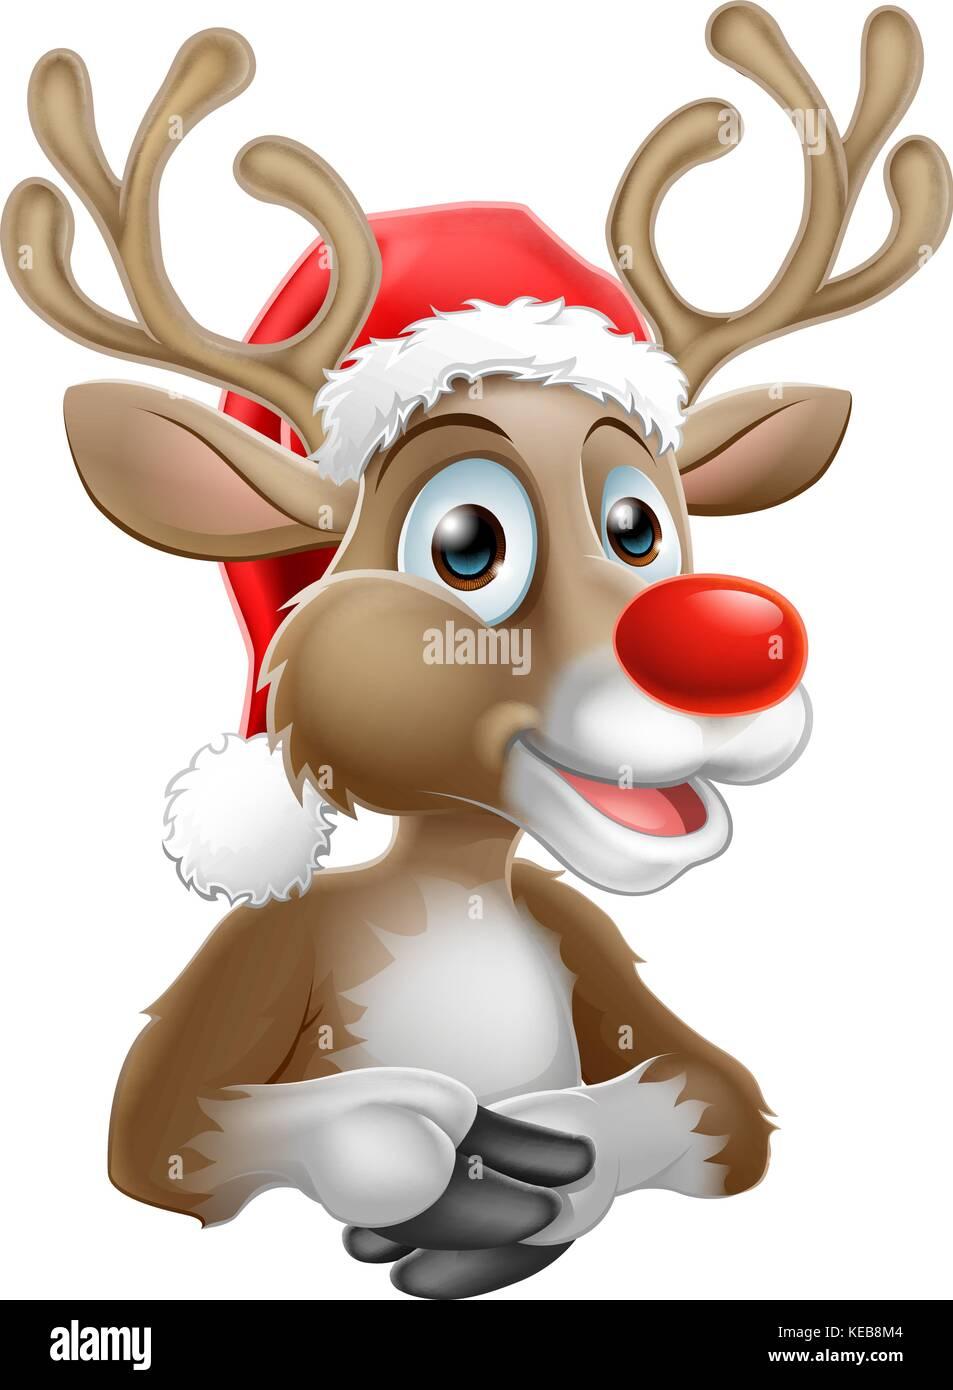 Cartoon Reindeer With Christmas Santa Hat - Stock Image